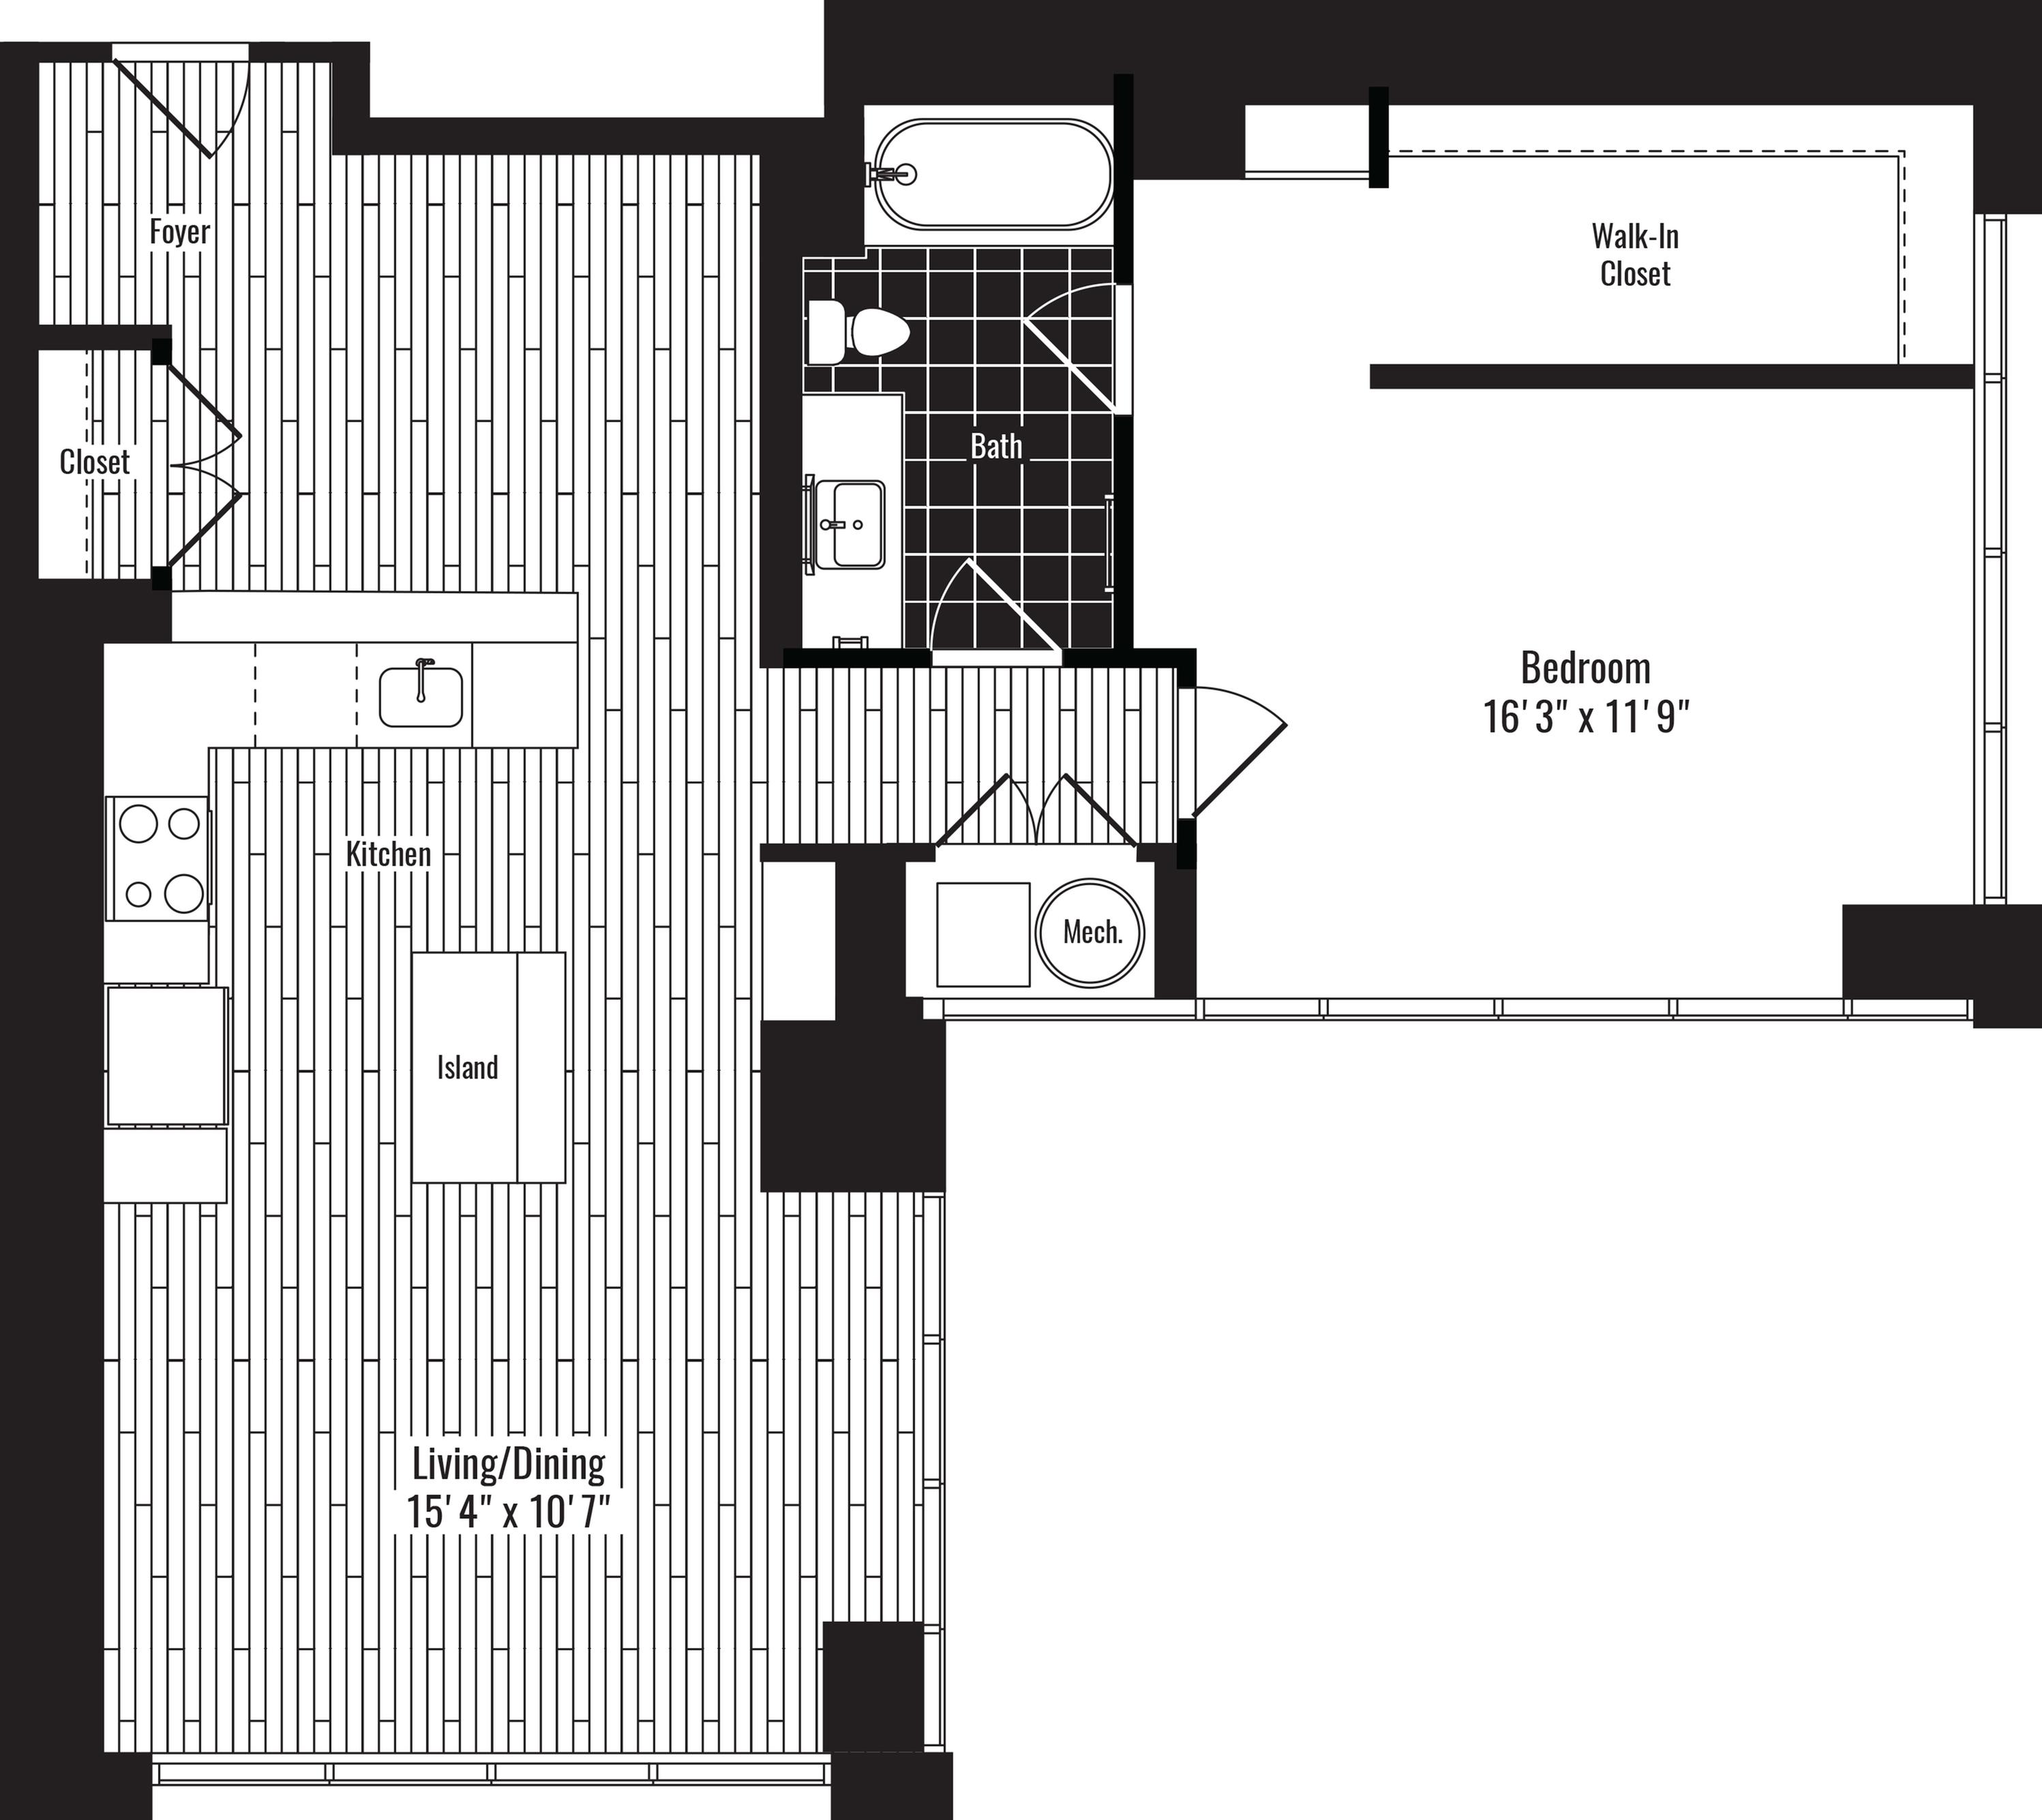 975 square foot one bedroom one bath apartment floorplan image